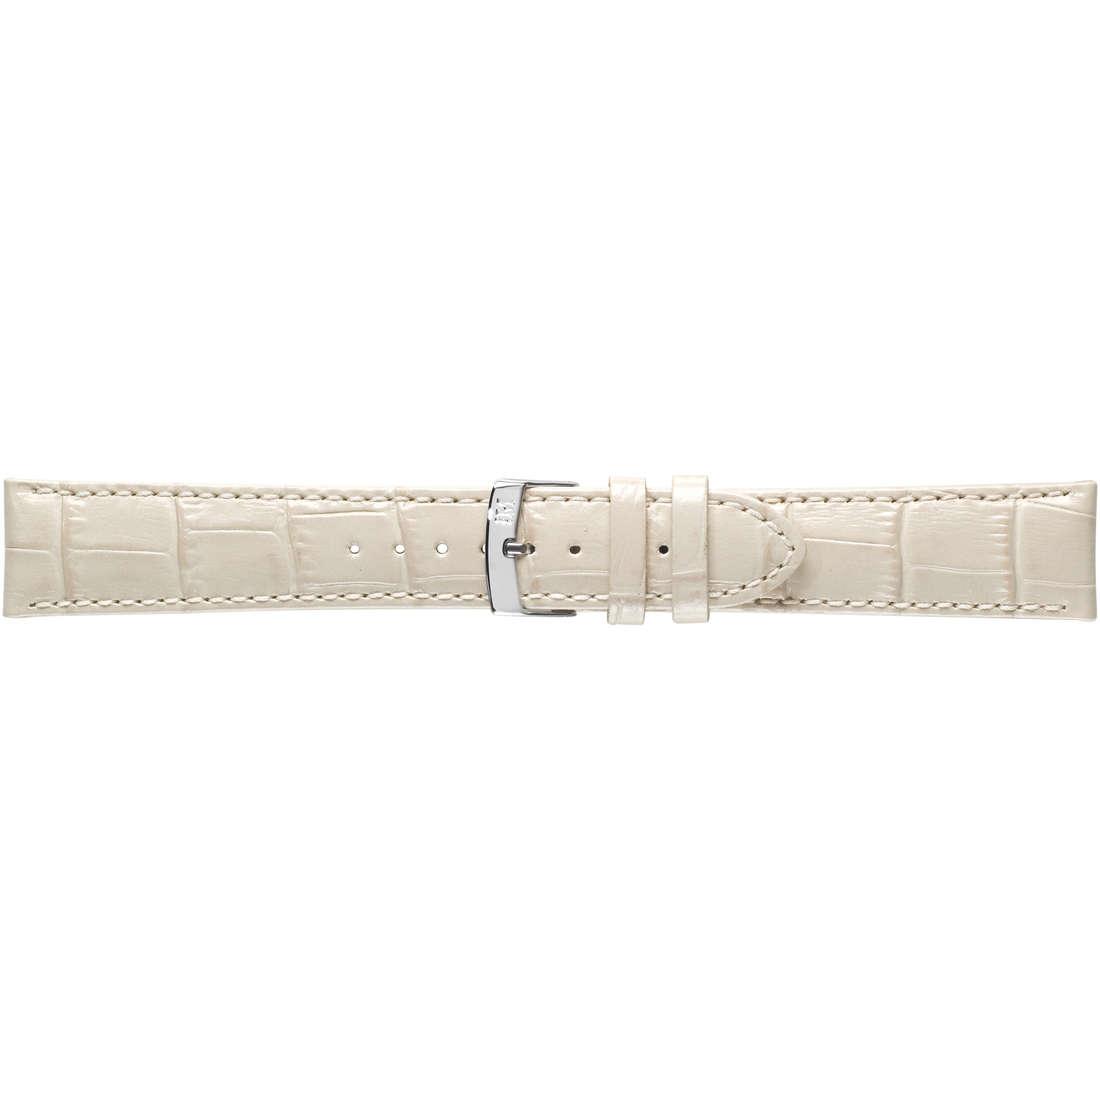 montre bande de montres homme Morellato Performance A01X2704656326CR22